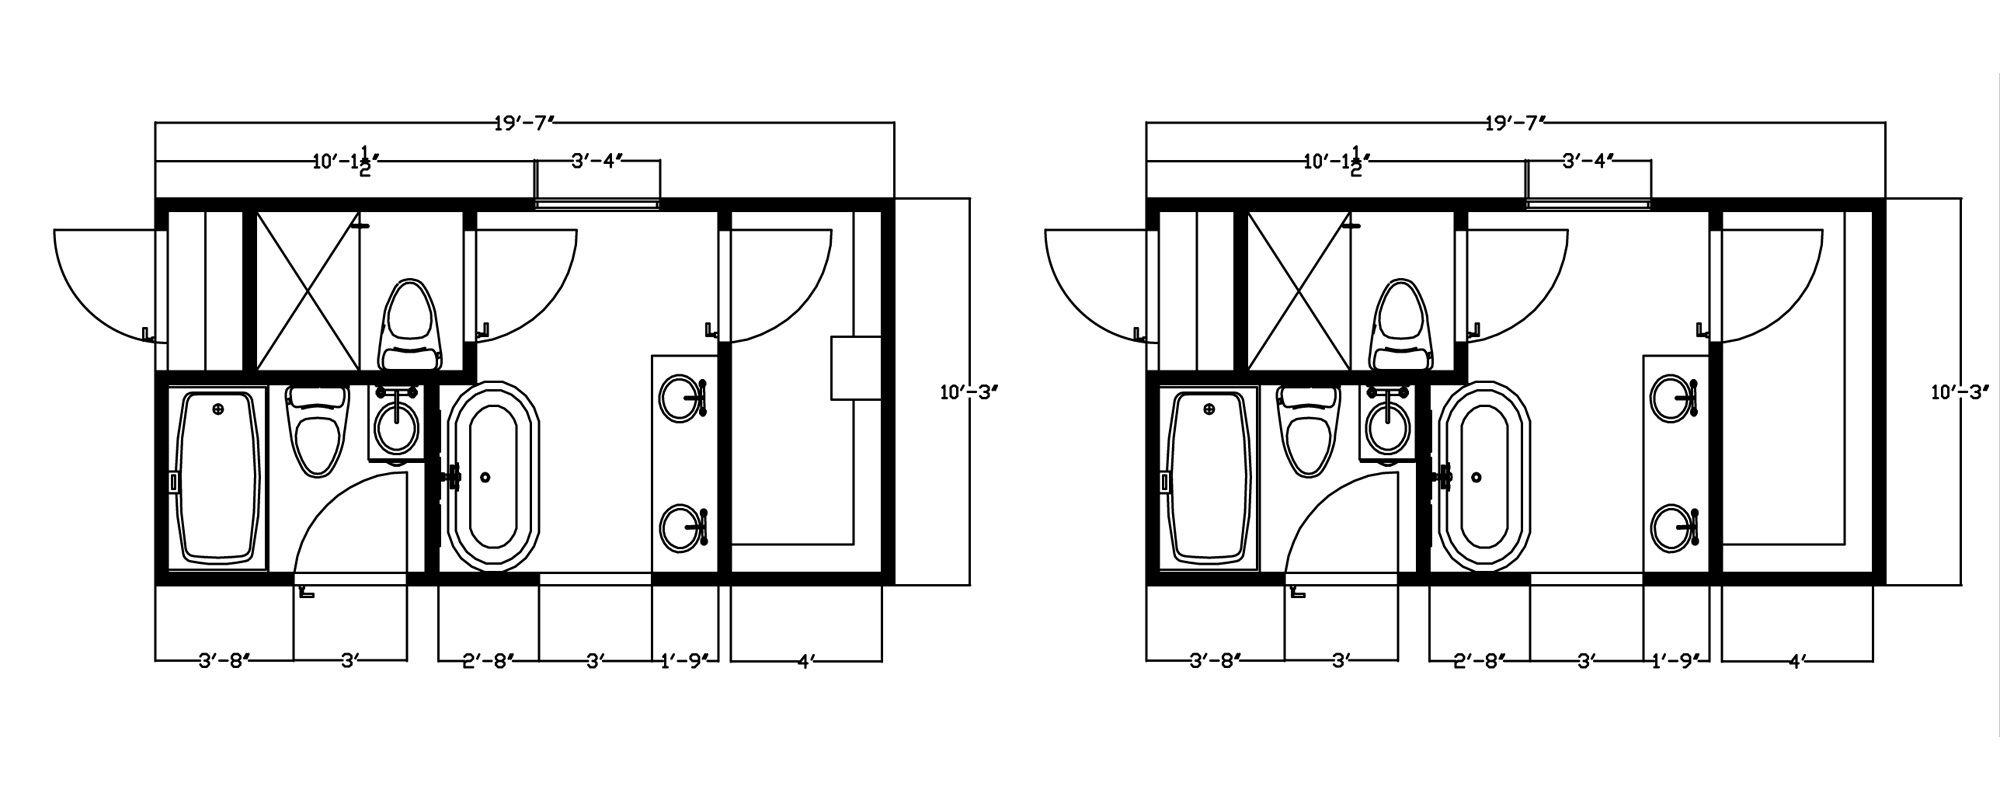 10X12 Master Bath Floor Plans  10X12 Master Bath Floor